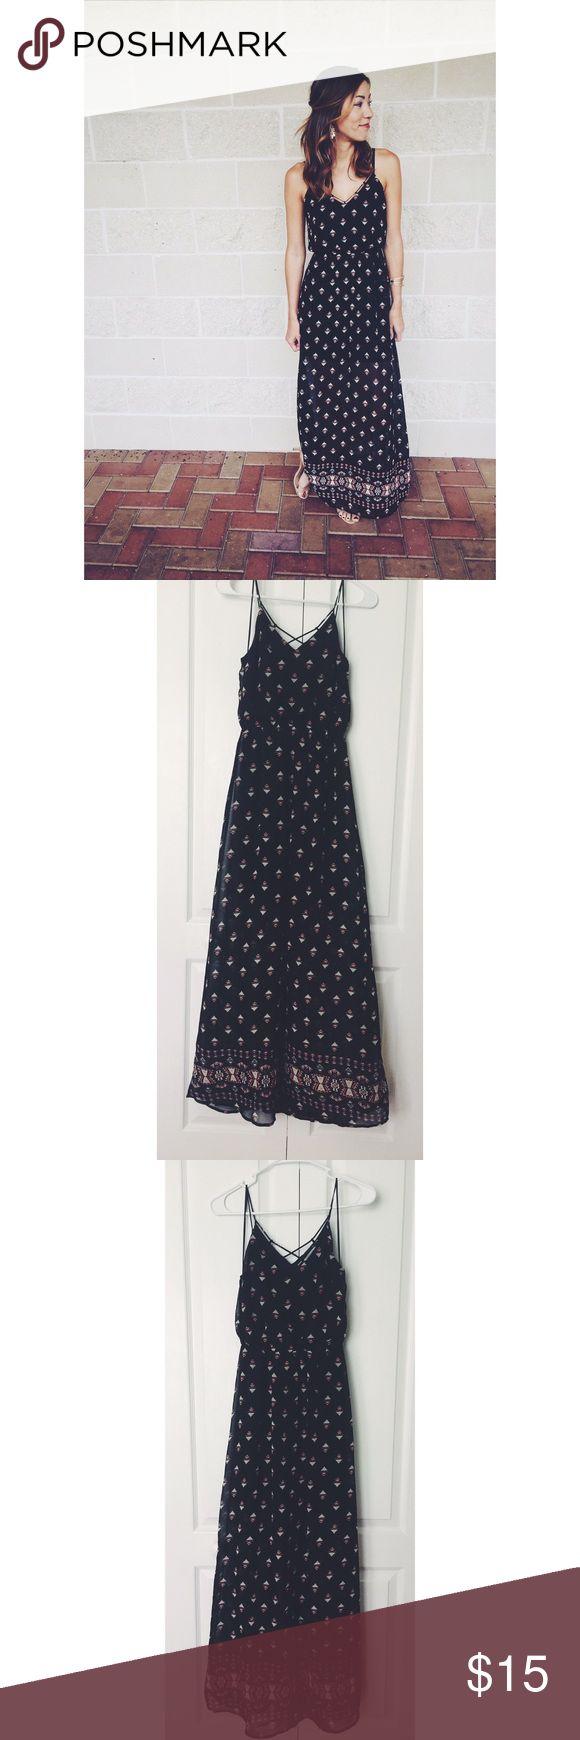 Sierra Sky Black Tribal Maxi Dress Sierra Sky Black Tribal Maxi Dress | Gently Used | Sheer Overlay | Size XS Sierra Sky Dresses Maxi